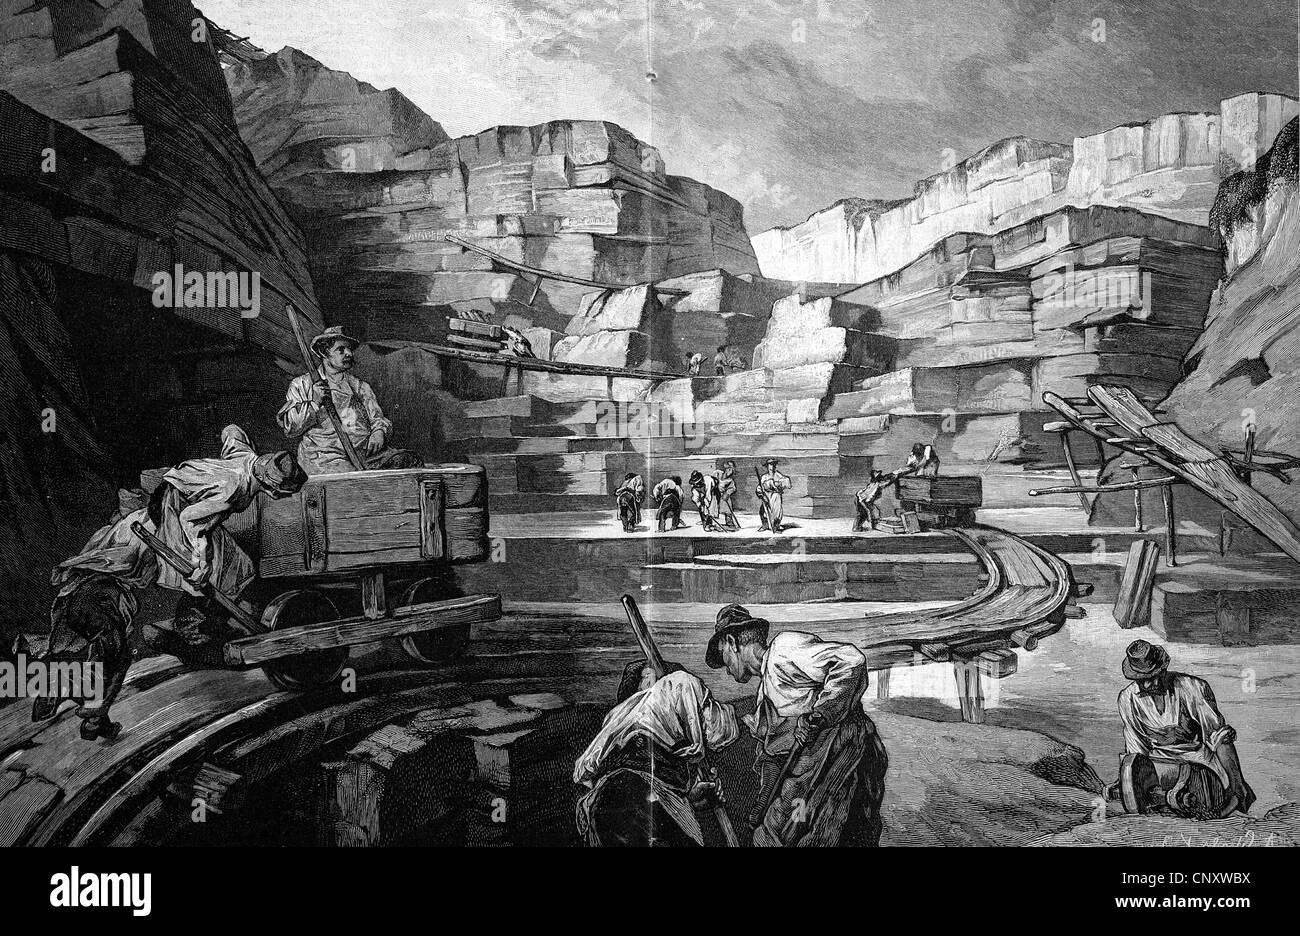 The Moernsheimer quarry near Sonthofen, Historical Illustration, woodcut, ca 1888 - Stock Image